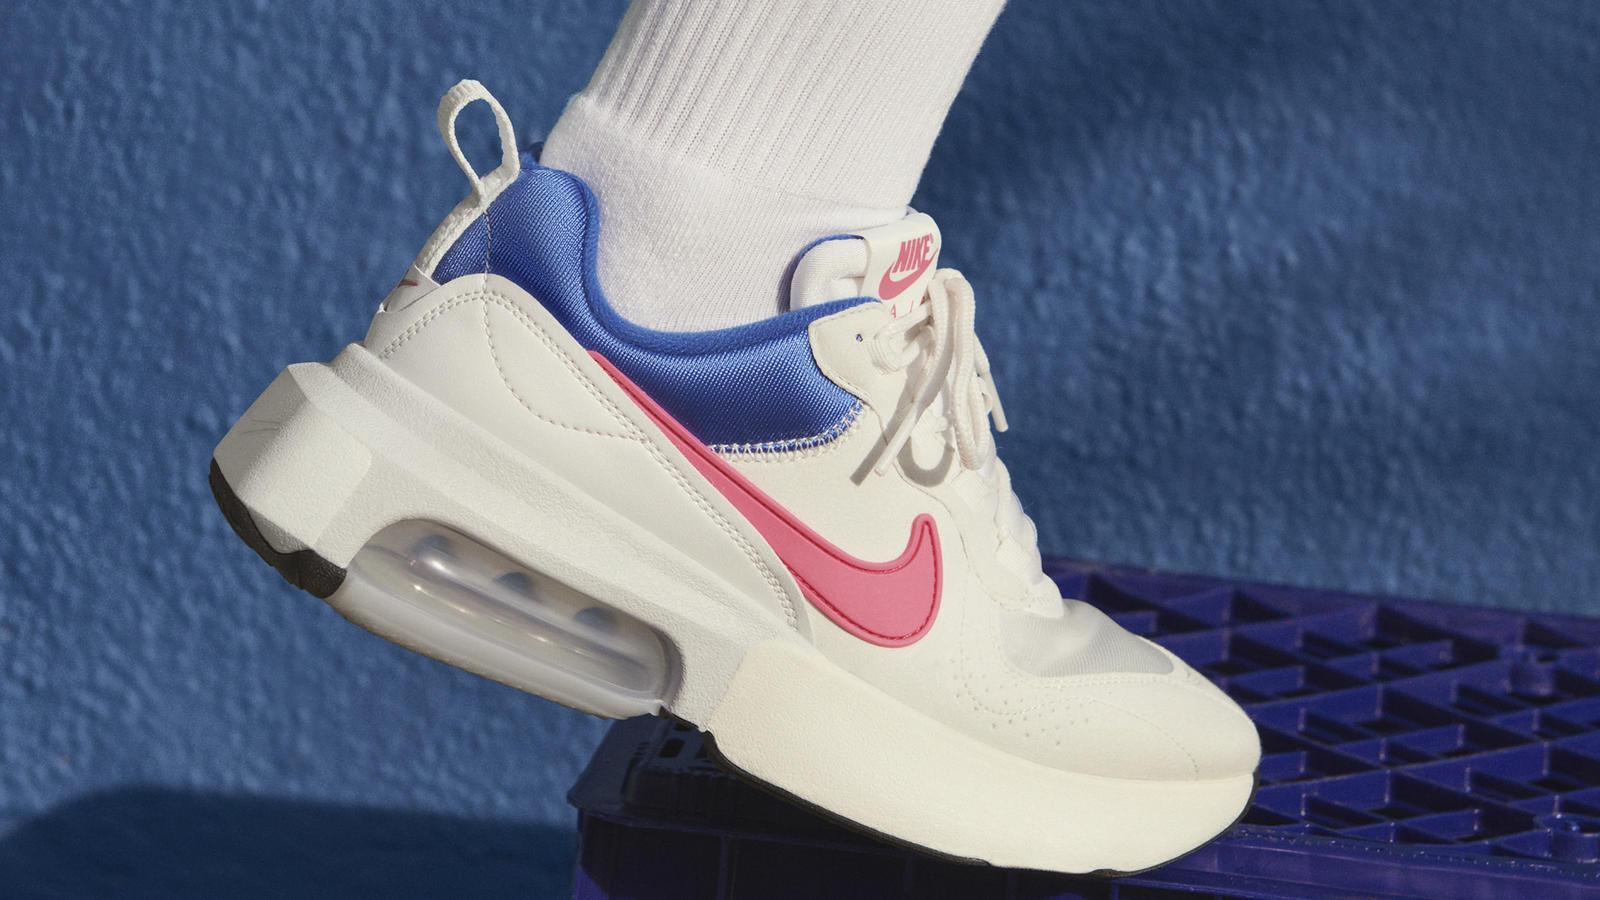 Nike Air Max Verona Summer 2020 8